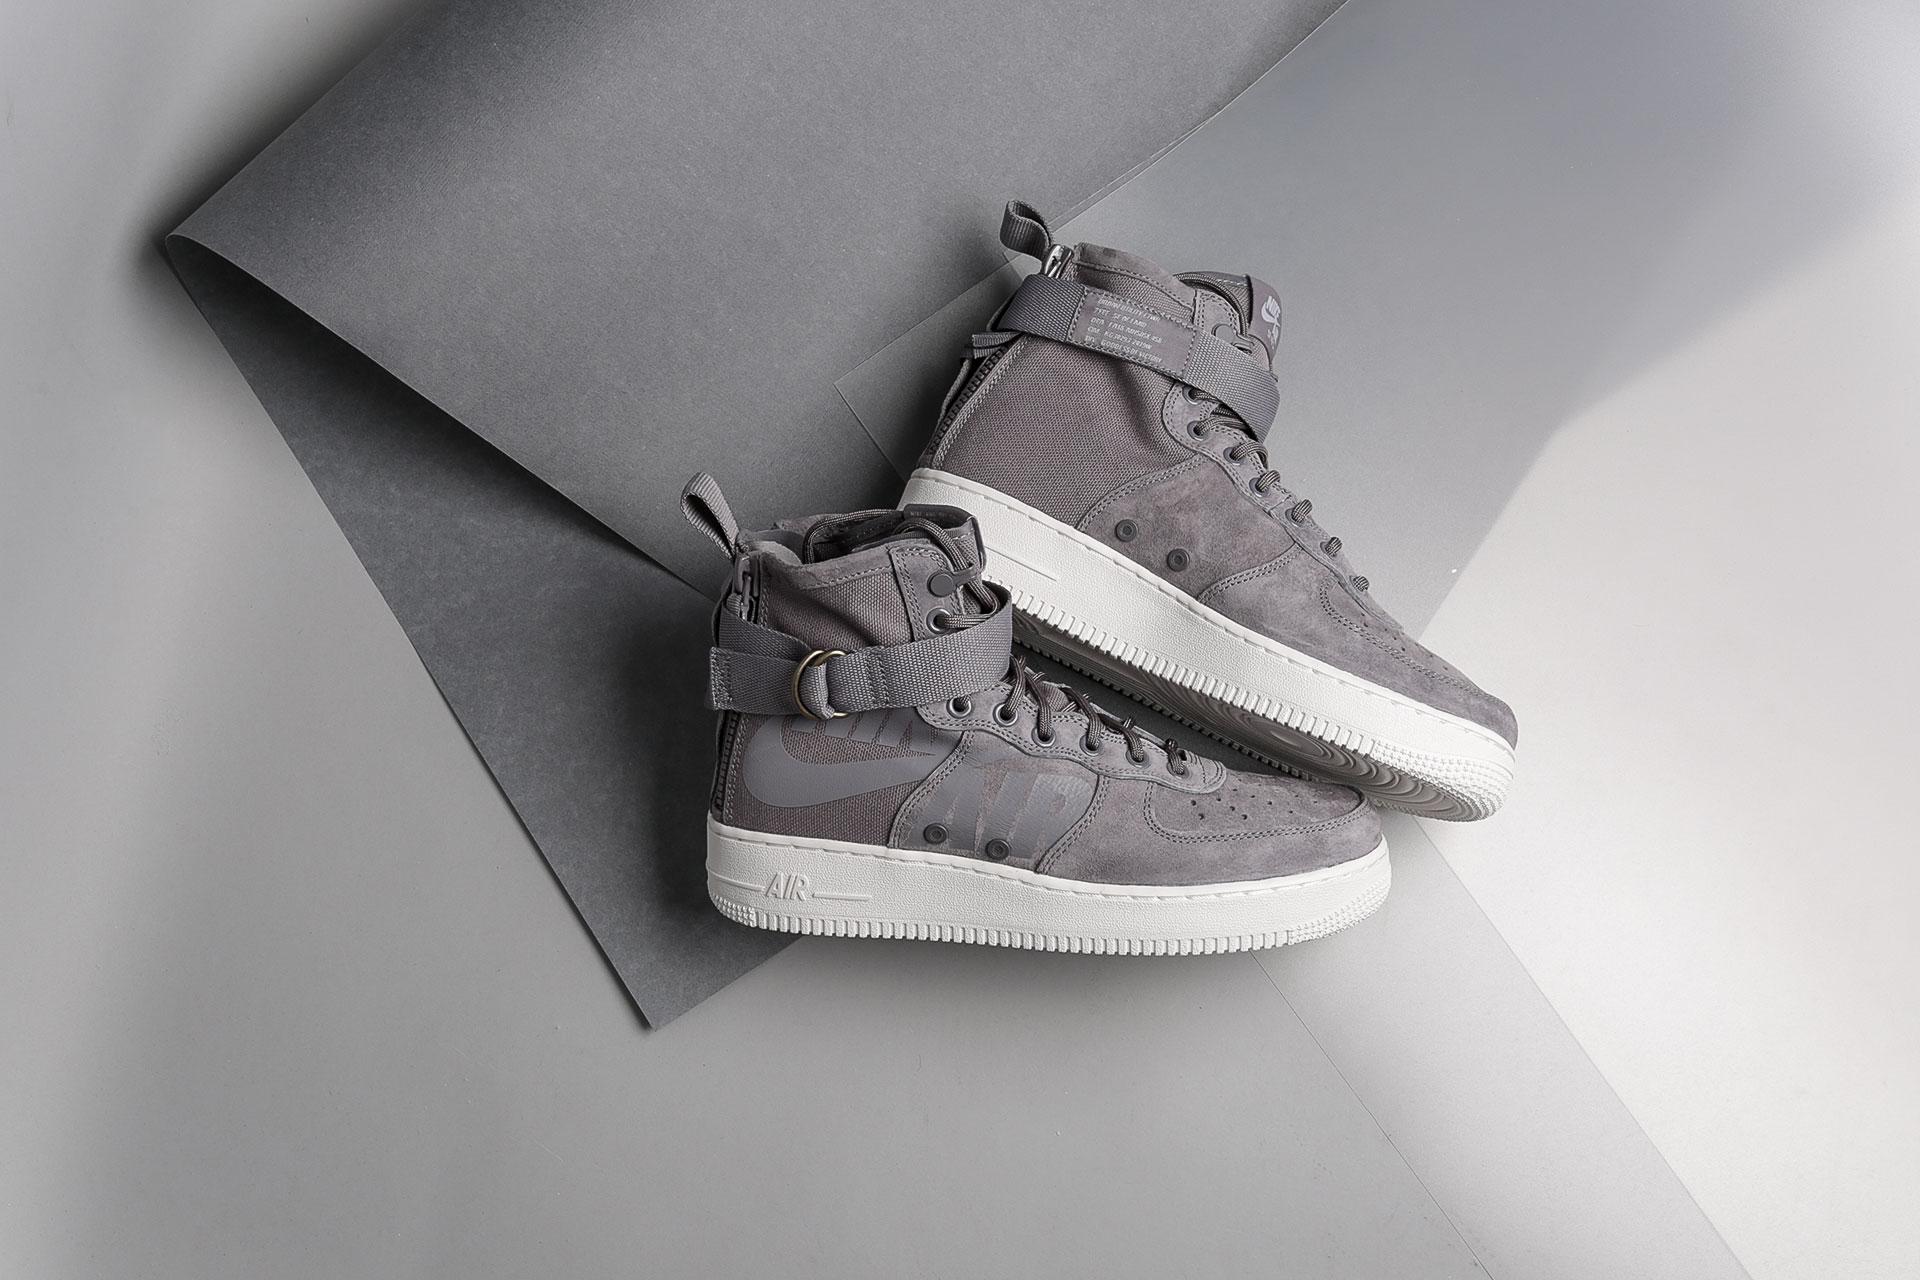 00f534f6 Купить серые мужские кроссовки SF Air Force 1 Mid от Nike (917753 ...